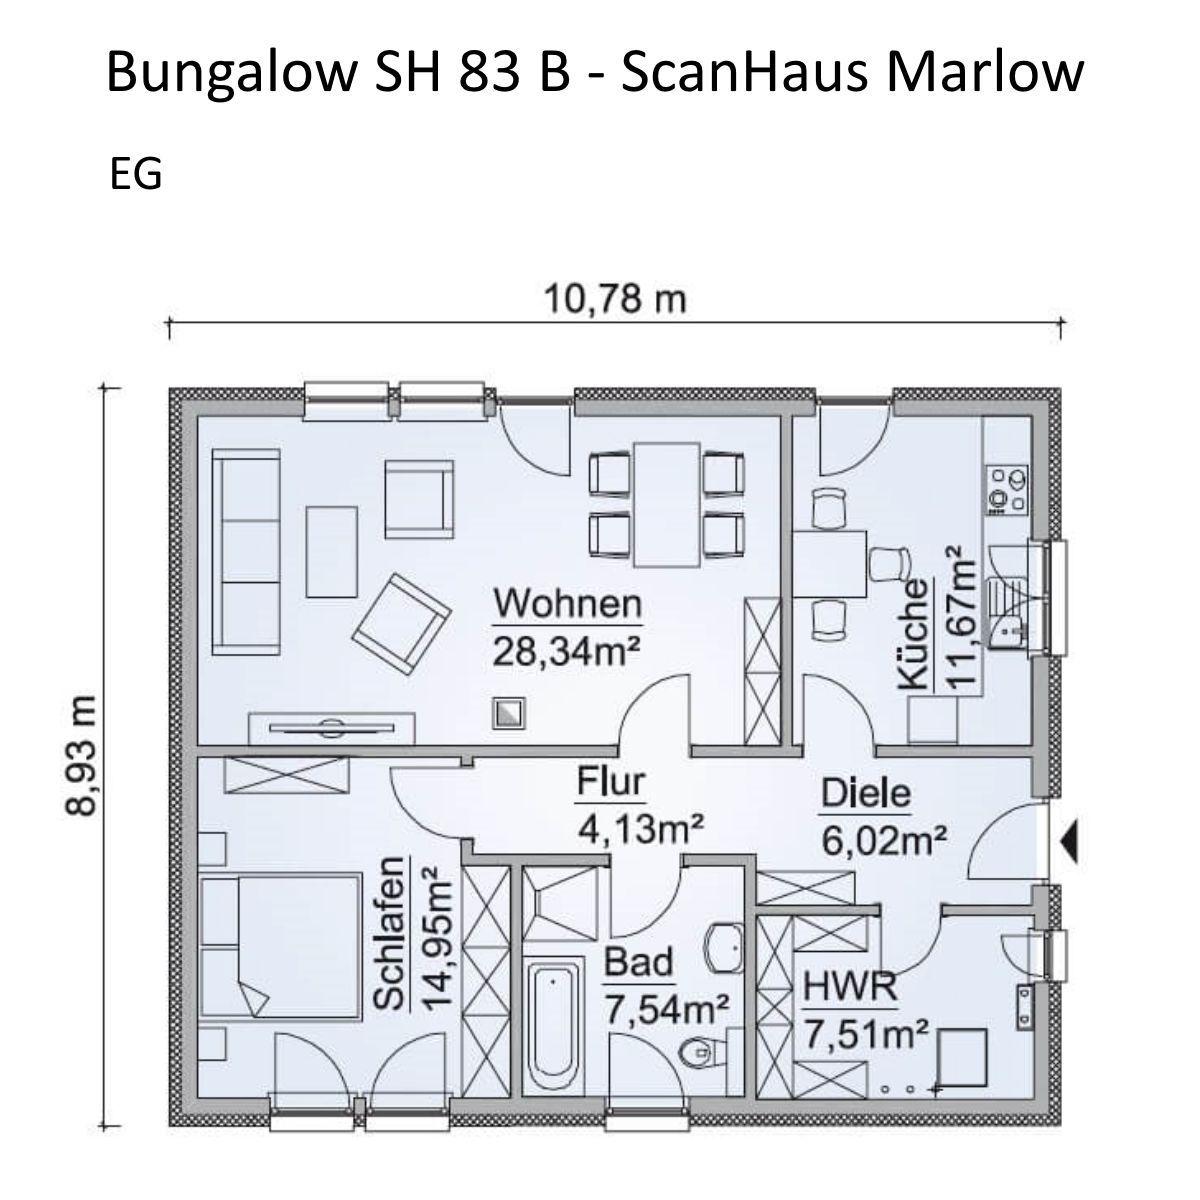 Grundriss Bungalow Haus Neubau modern mit Walmdach